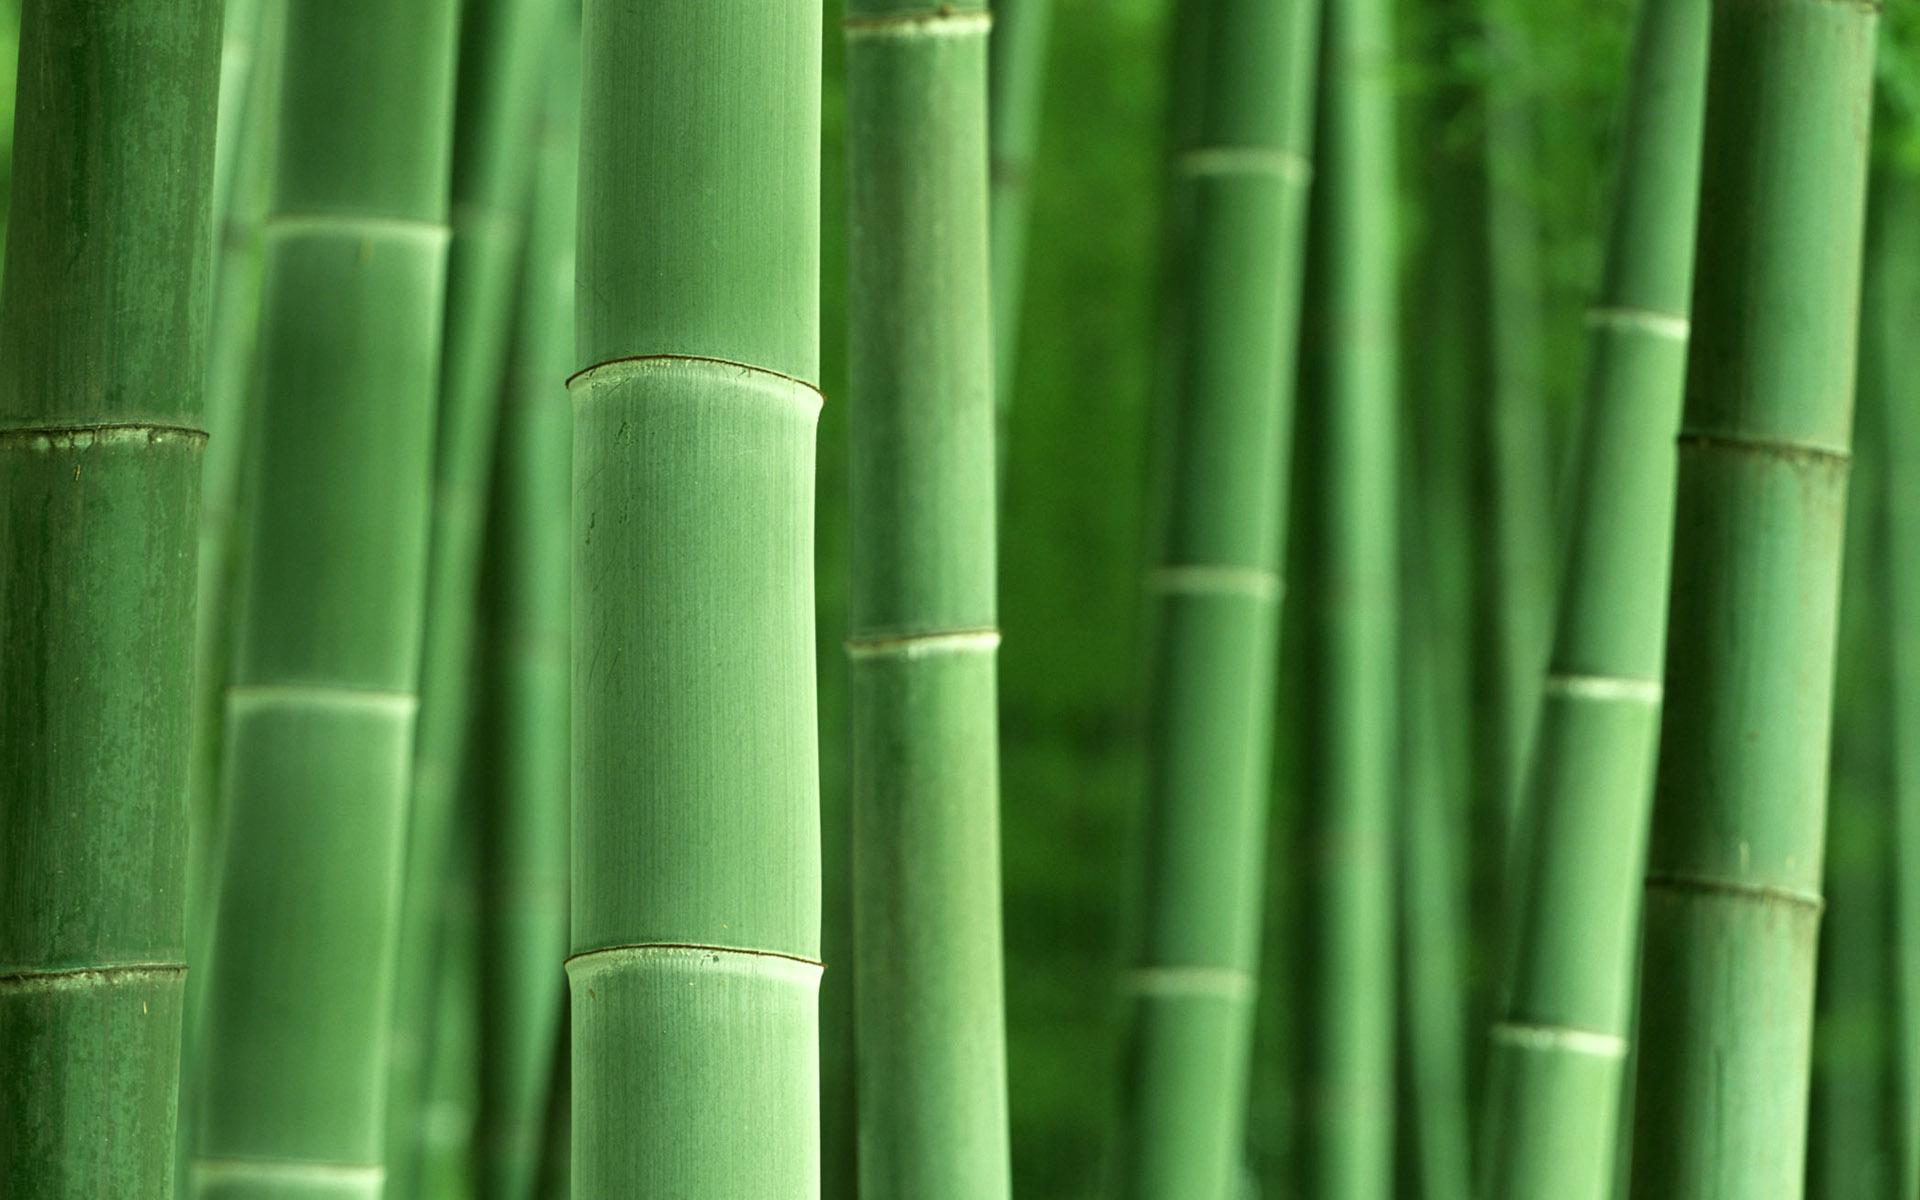 Bamboo Desktop Wallpaper